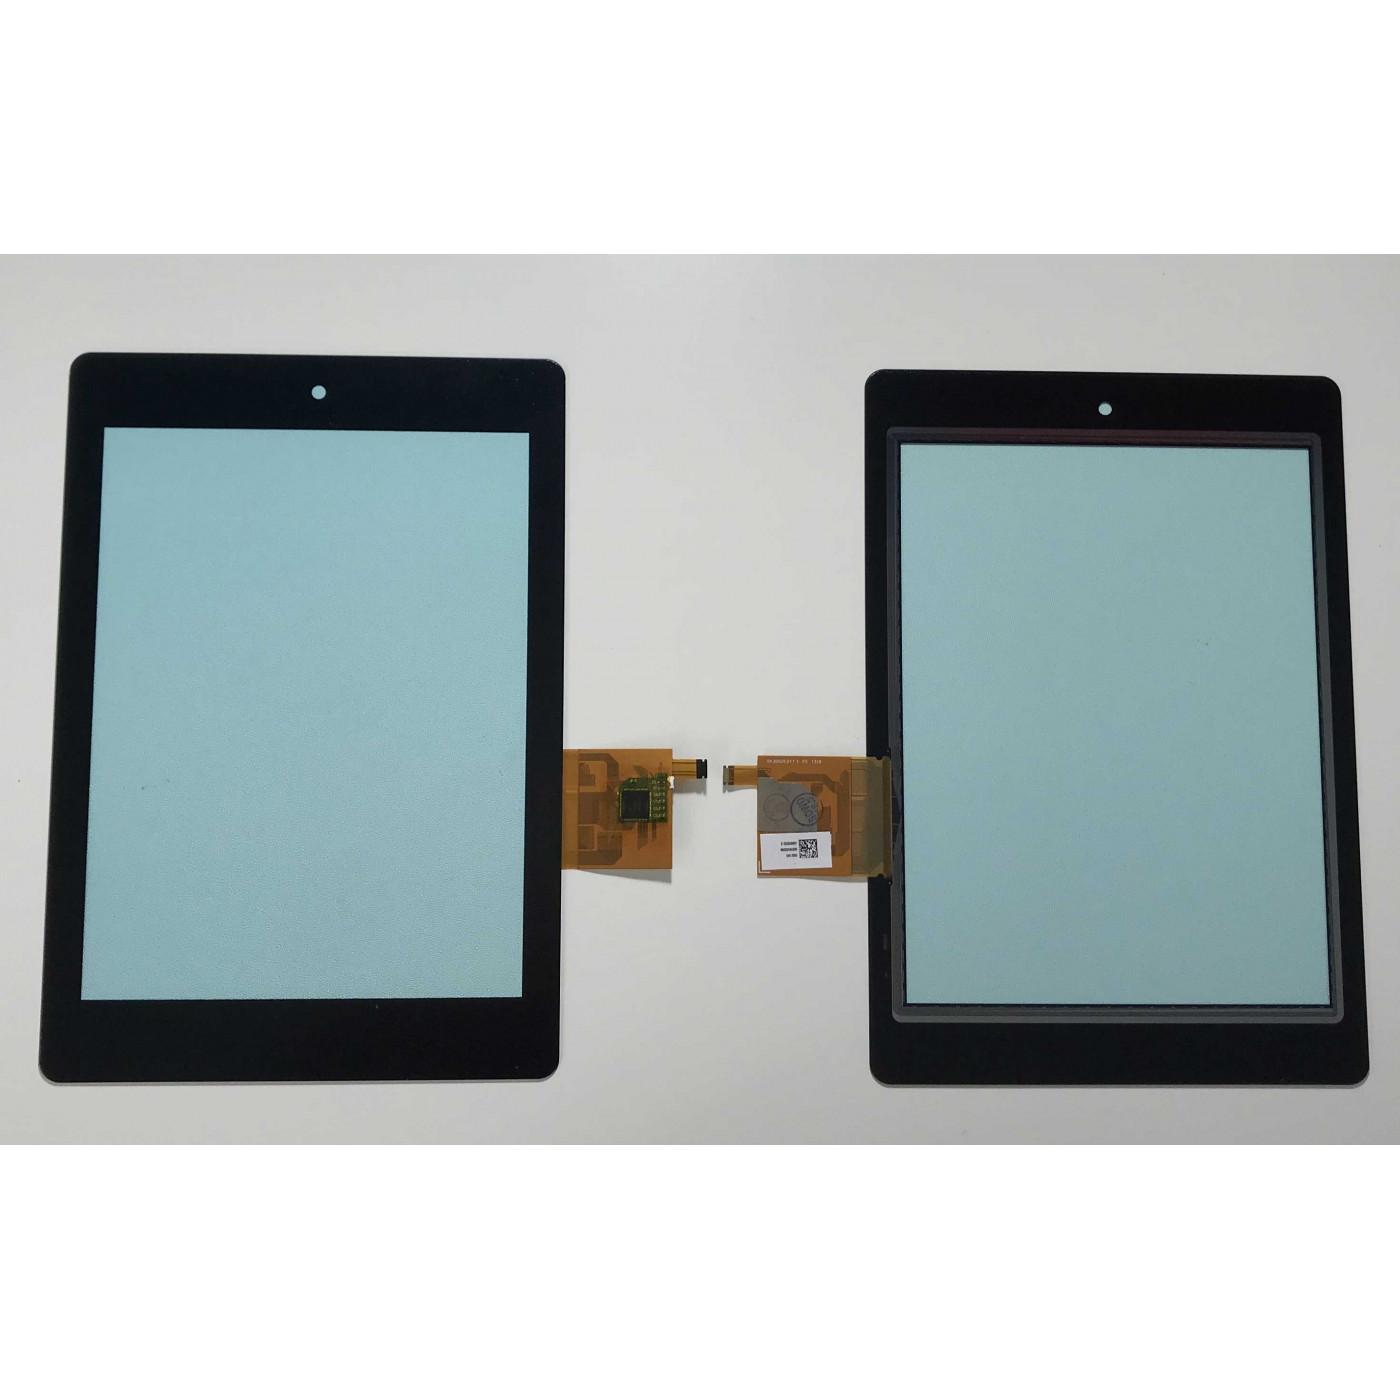 ECRAN TACTILE Digitizer Acer Iconia A1-811 GLASS 7.9 Noir